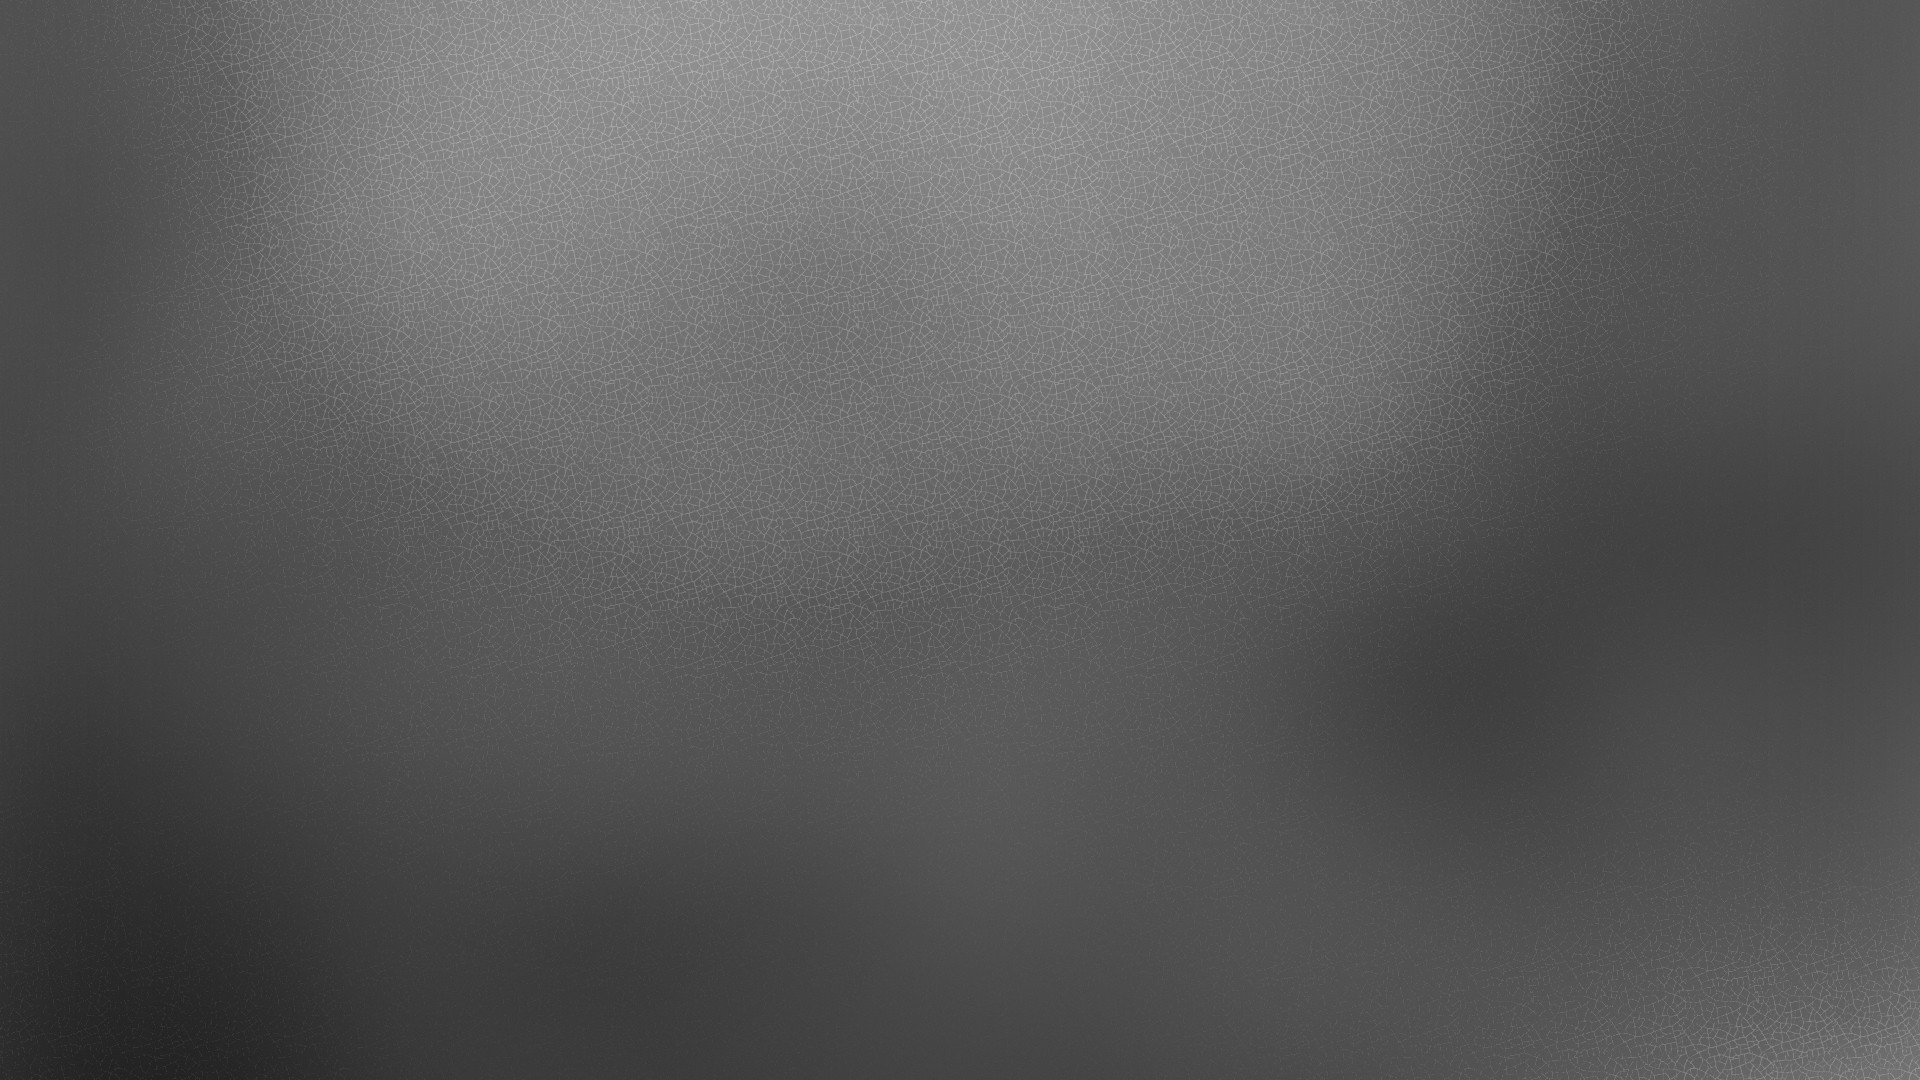 Metallic wallpaper ·① Download free HD wallpapers for ...